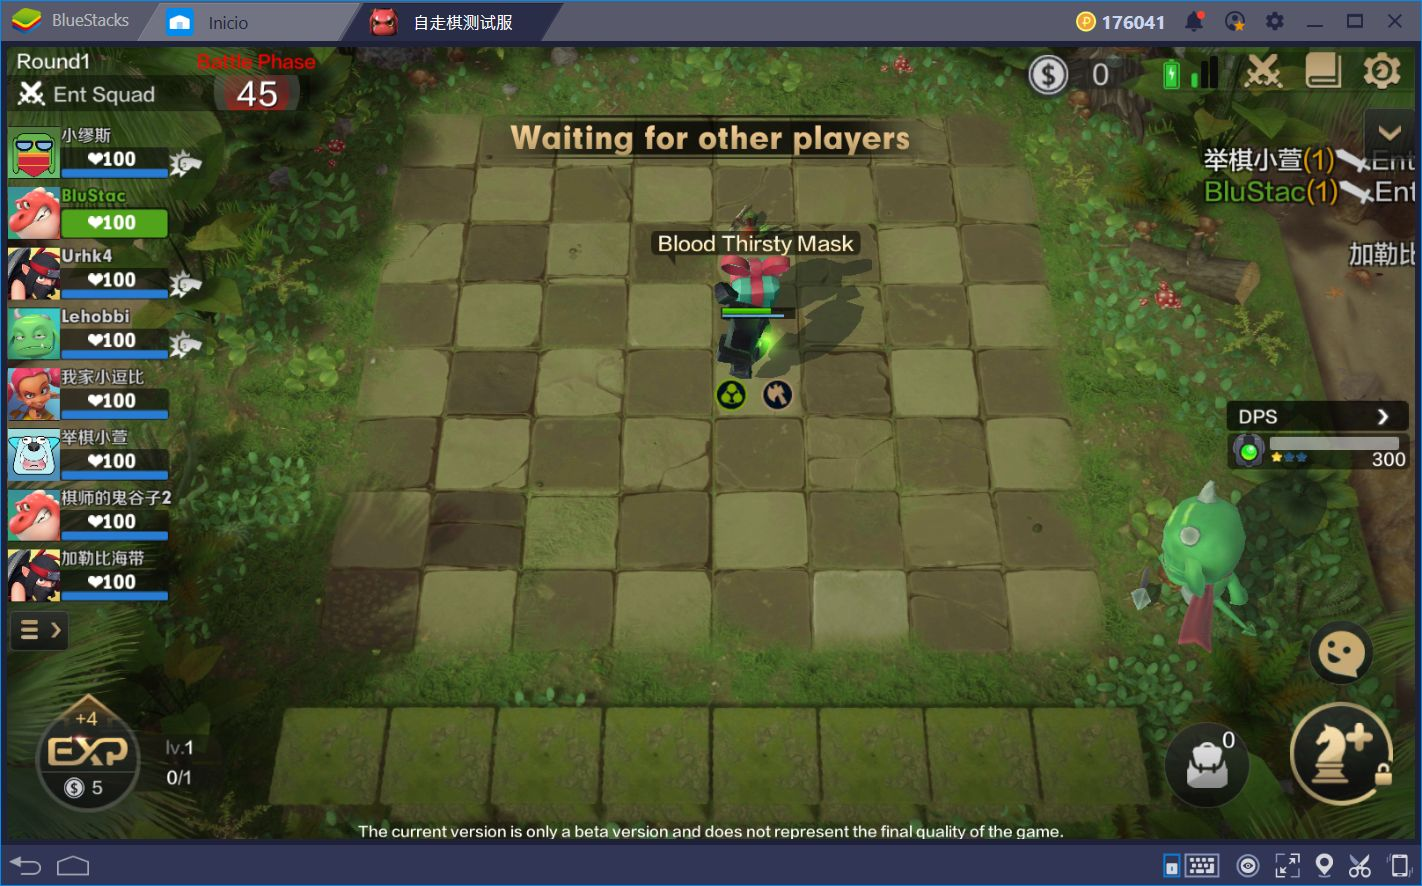 Auto Chess—El Popular Mapa Customizado de Dota 2, En tu Dispositivo Móvil